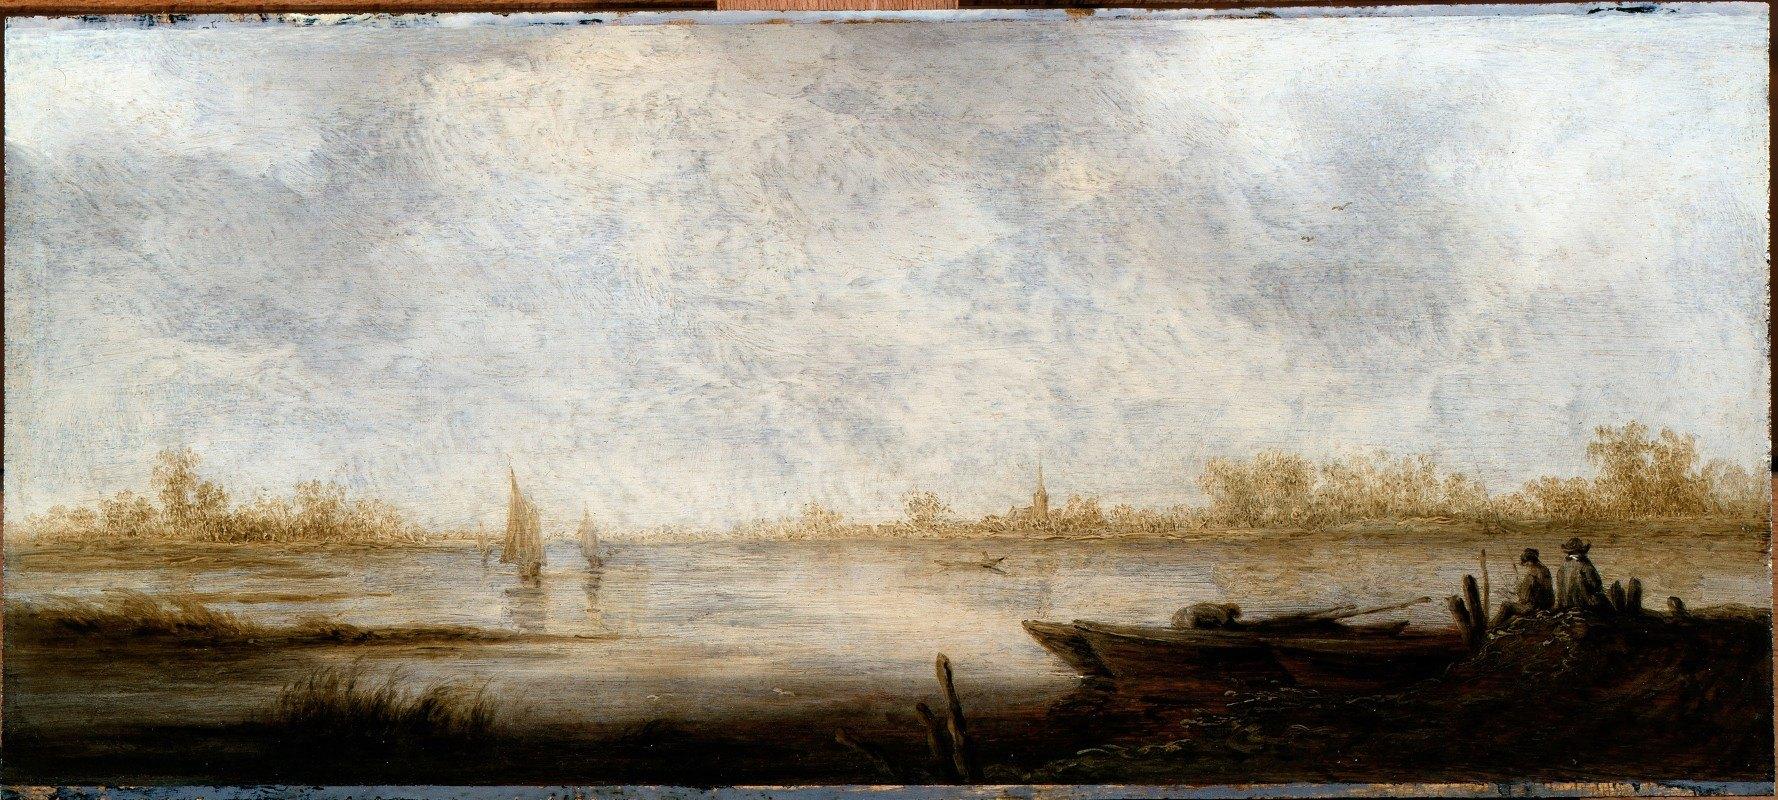 Aelbert Cuyp - River Landscape